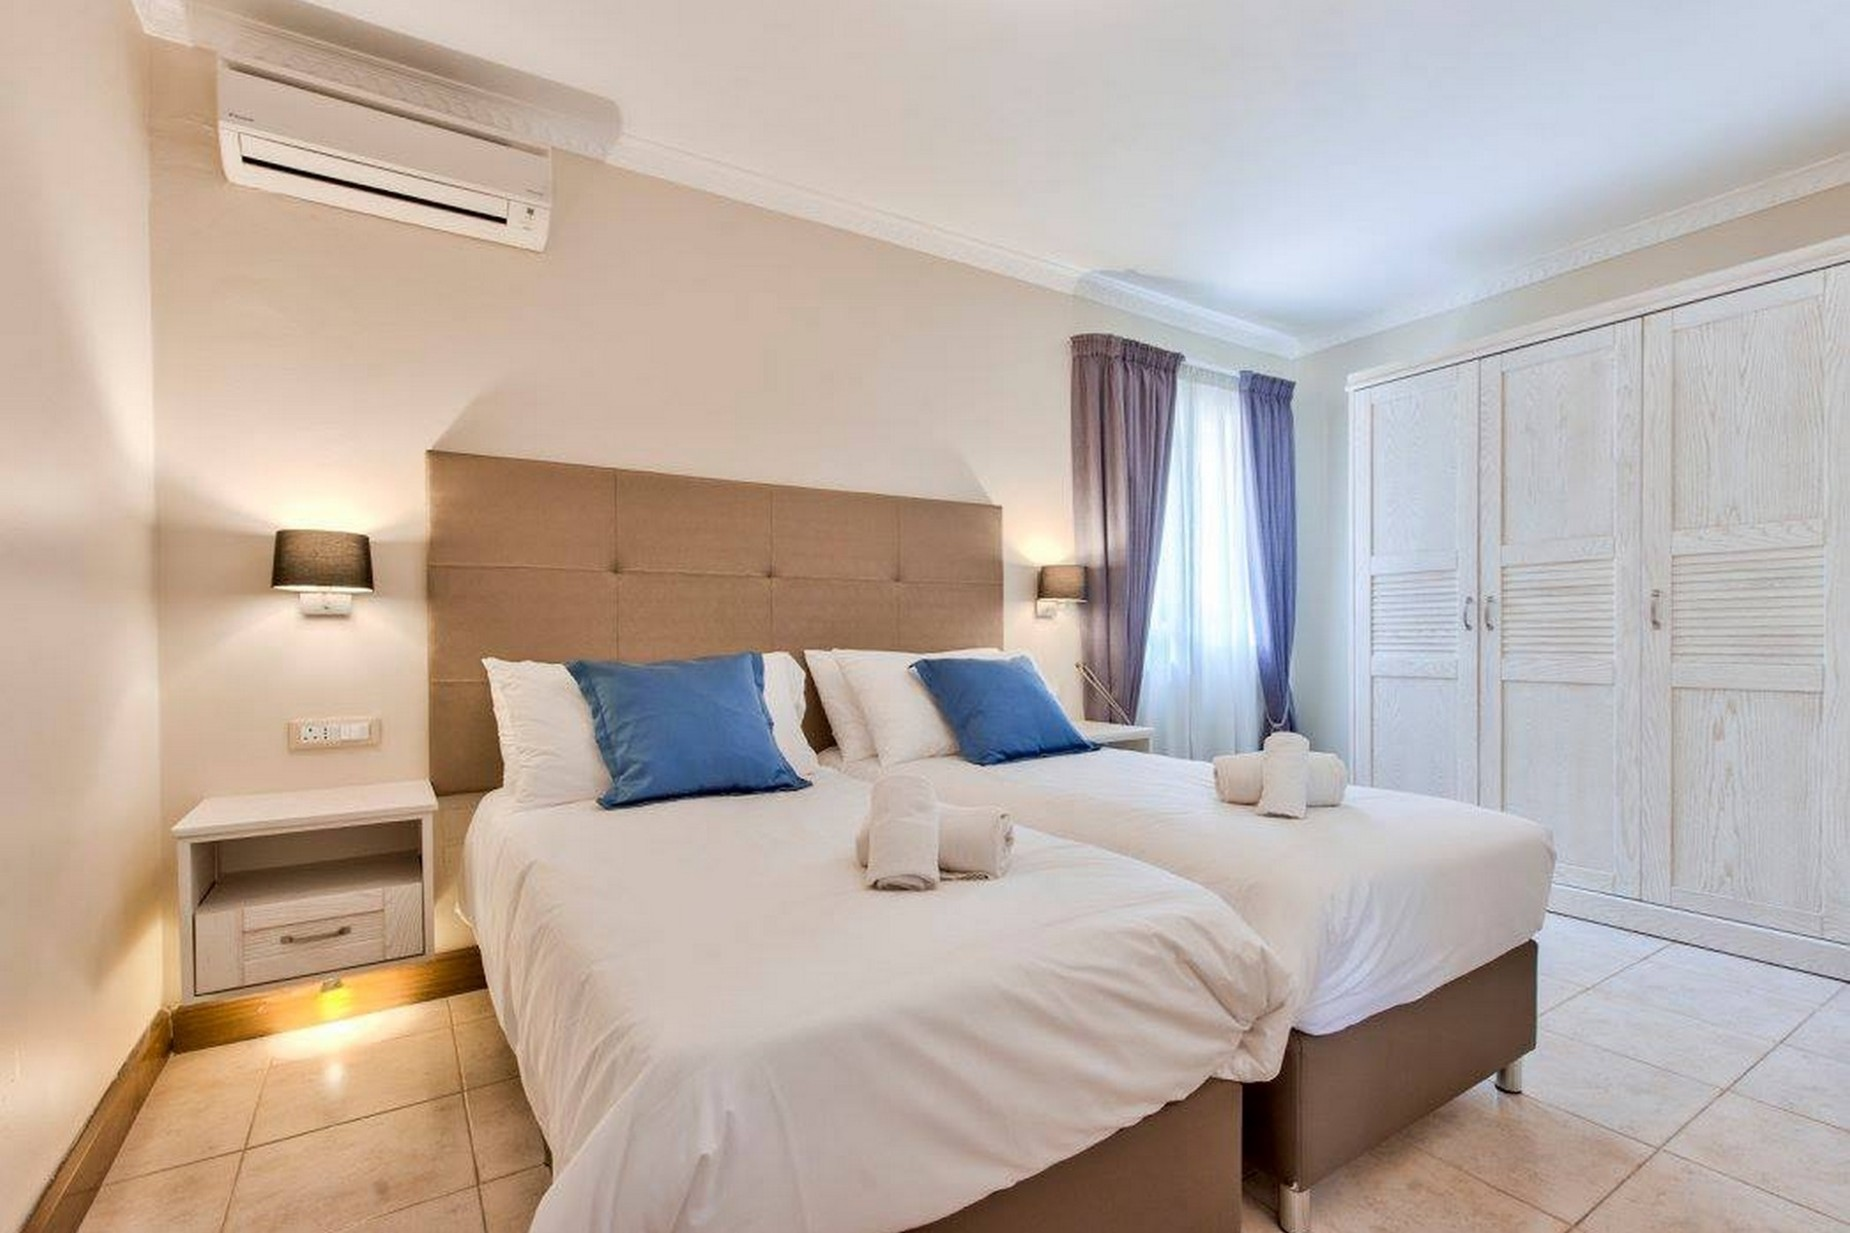 2 bed Villa For Rent in Mellieha, Mellieha - thumb 12